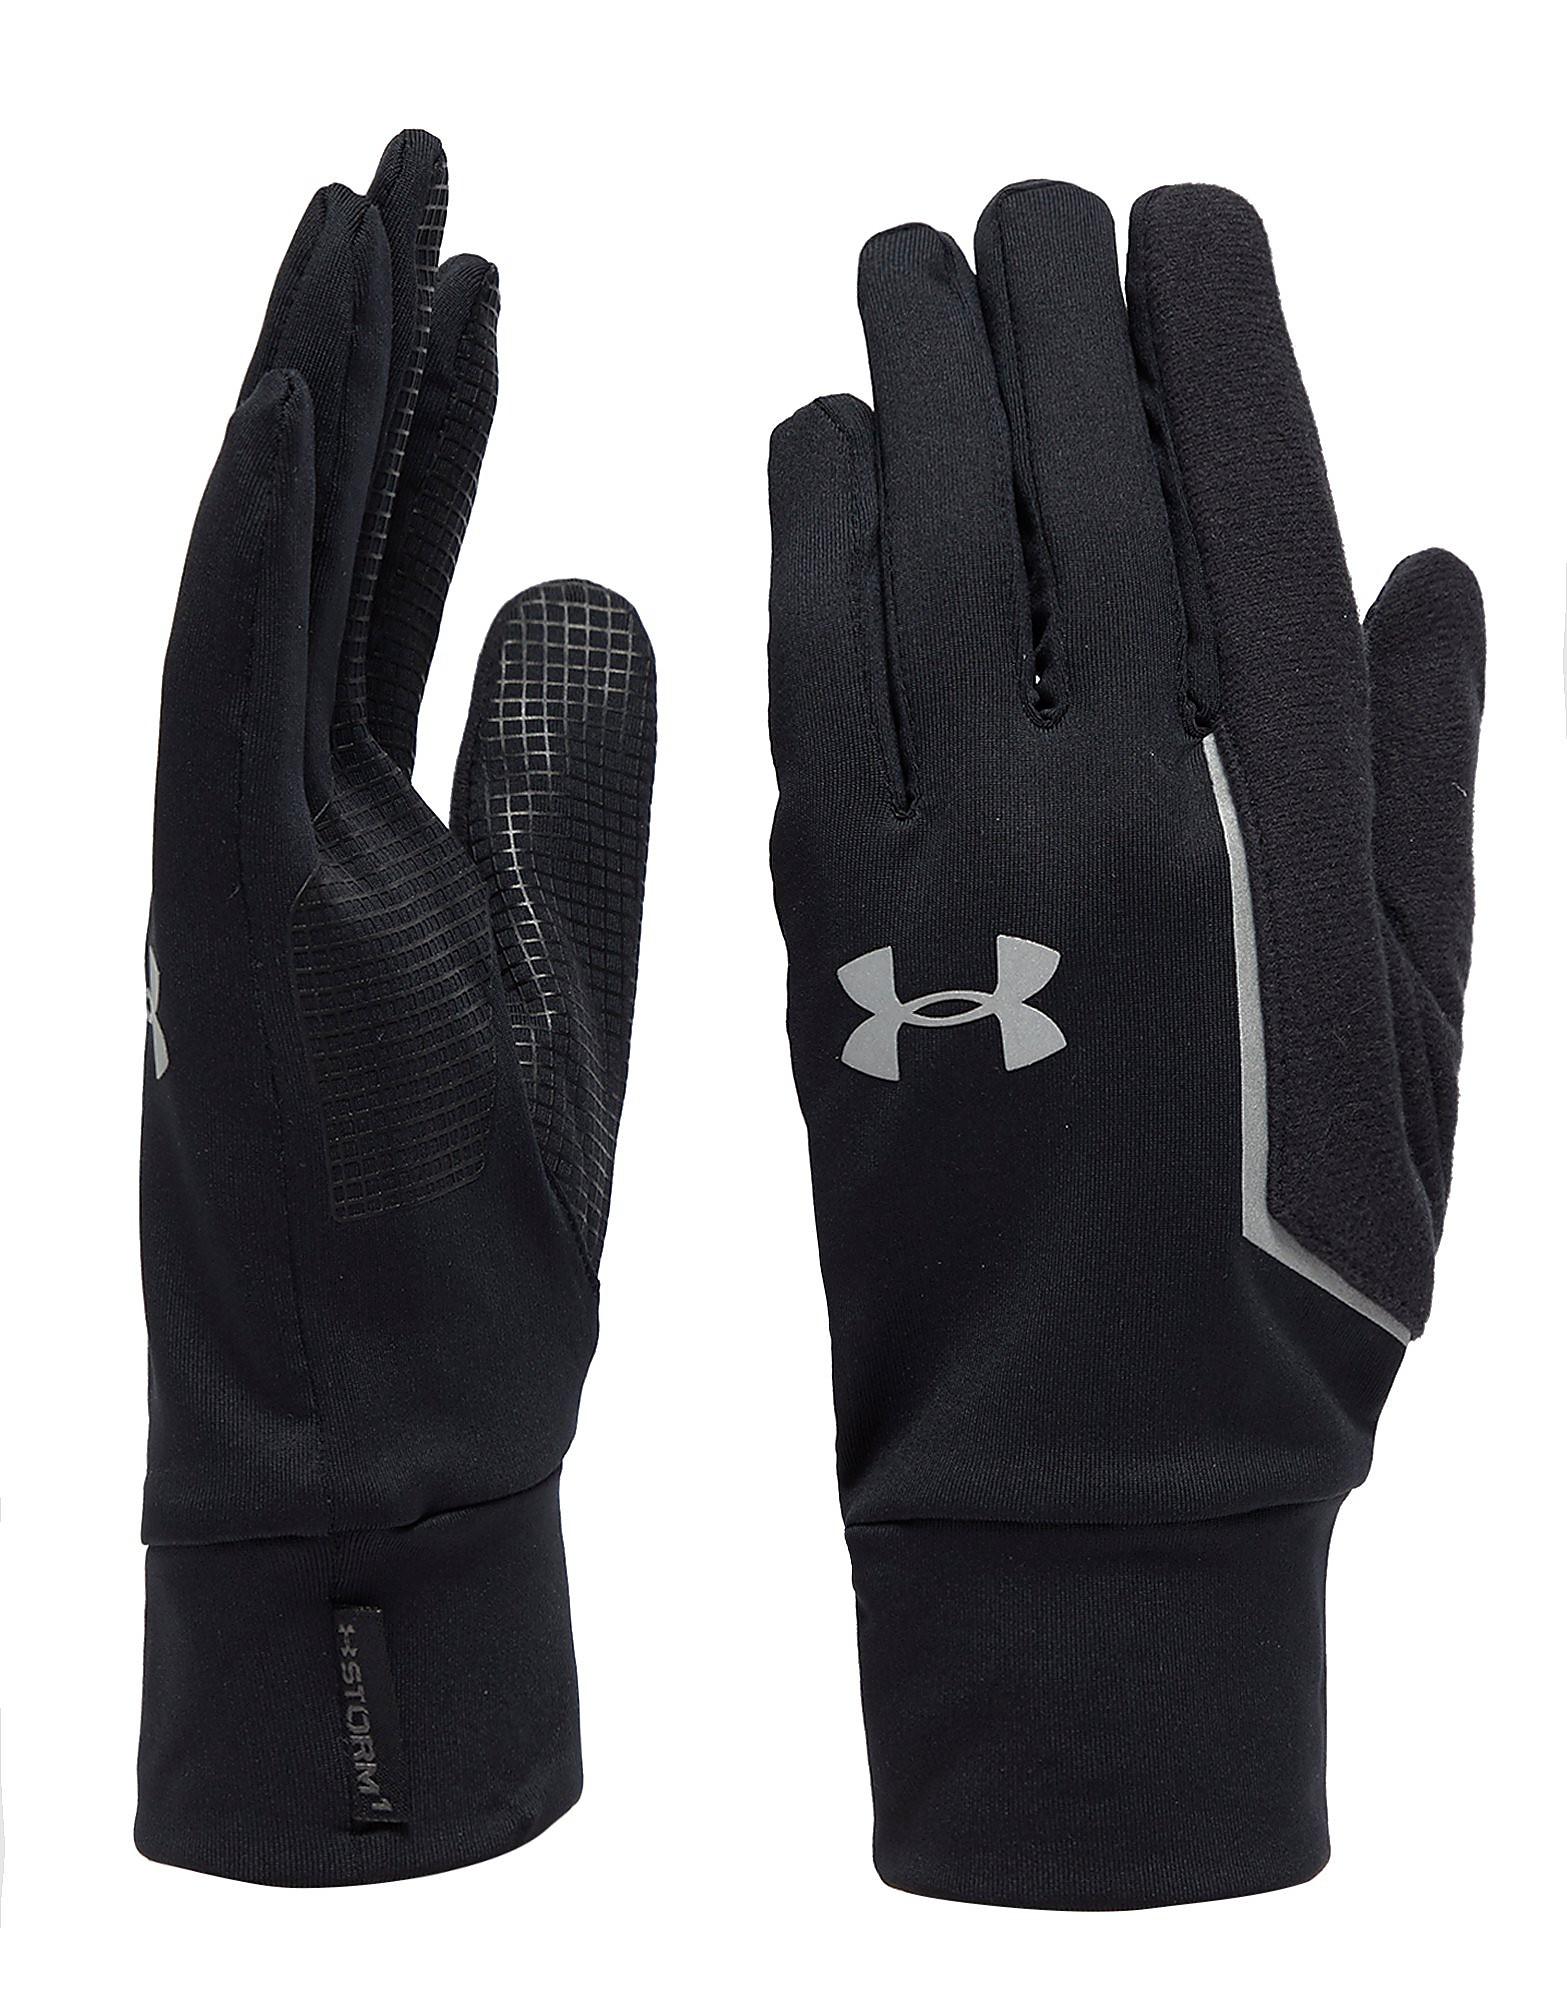 Leather gloves mens jd - Under Armour Nobreaks Armour Liner Gloves Black Silver Mens Black Silver